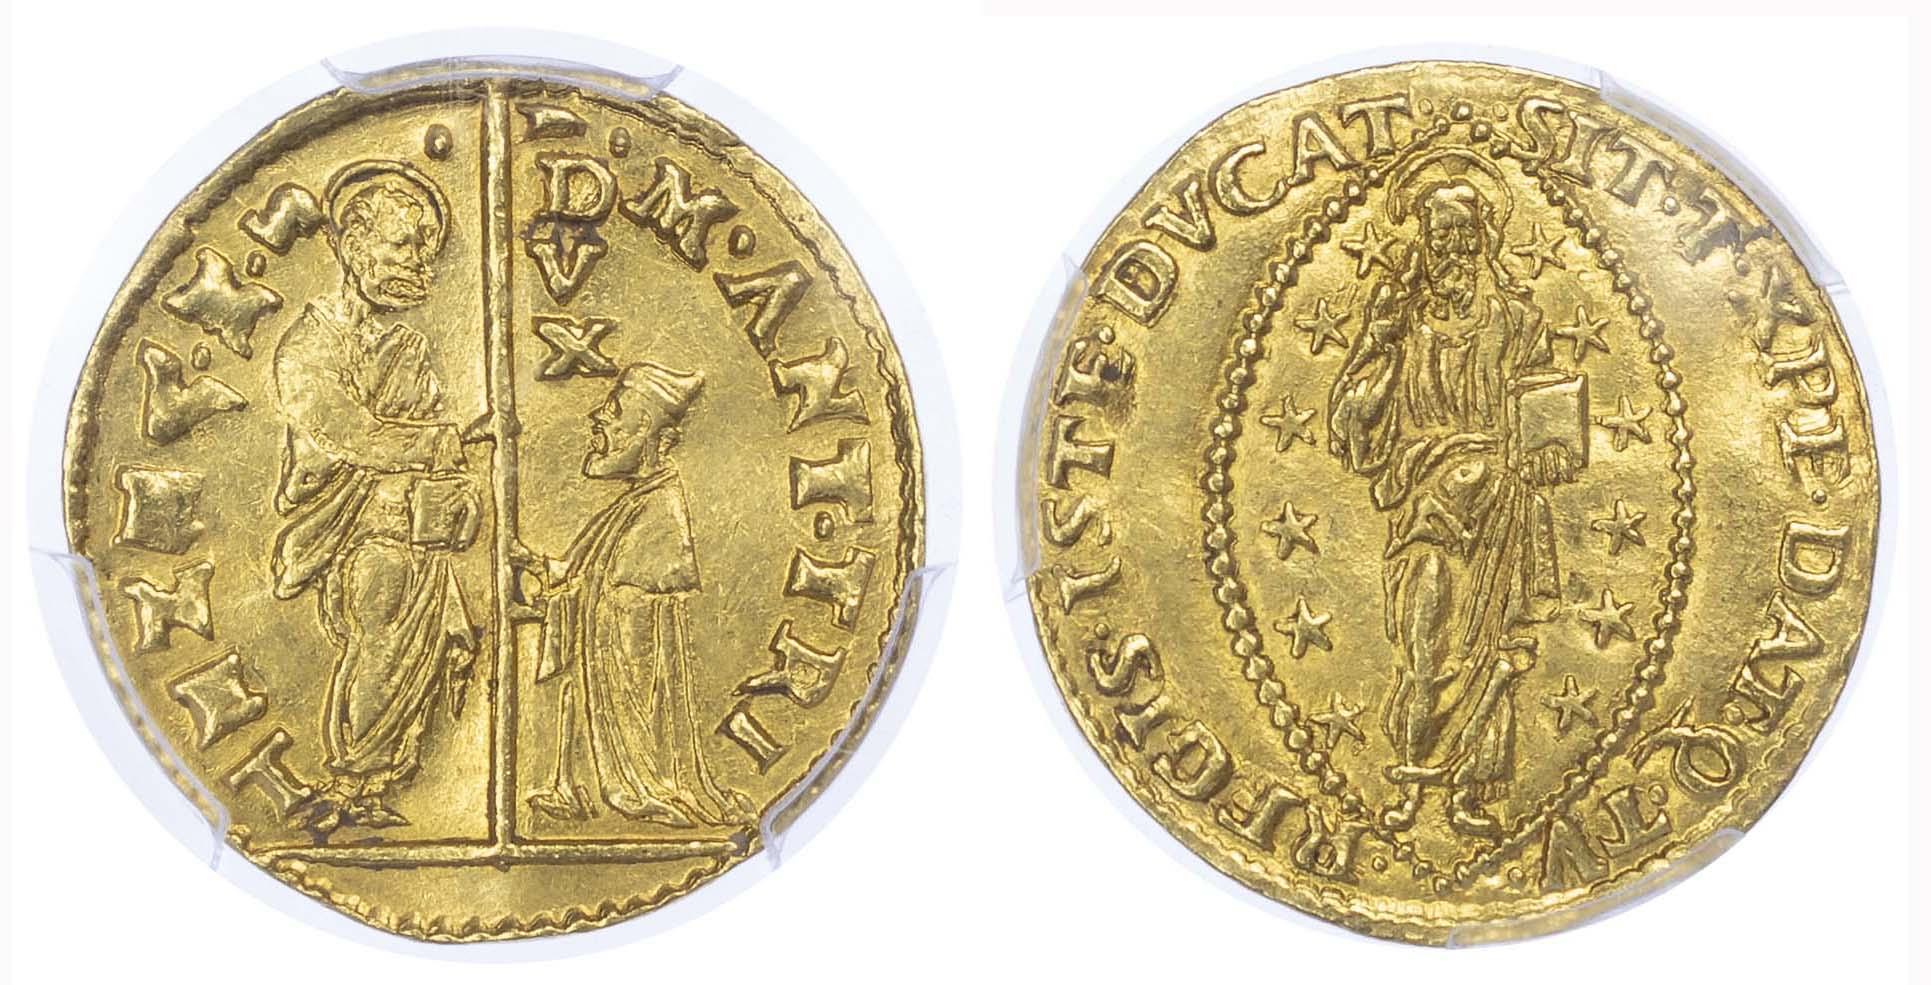 Italy, Venice, Marc'Antonio Trevisano, gold Zecchino